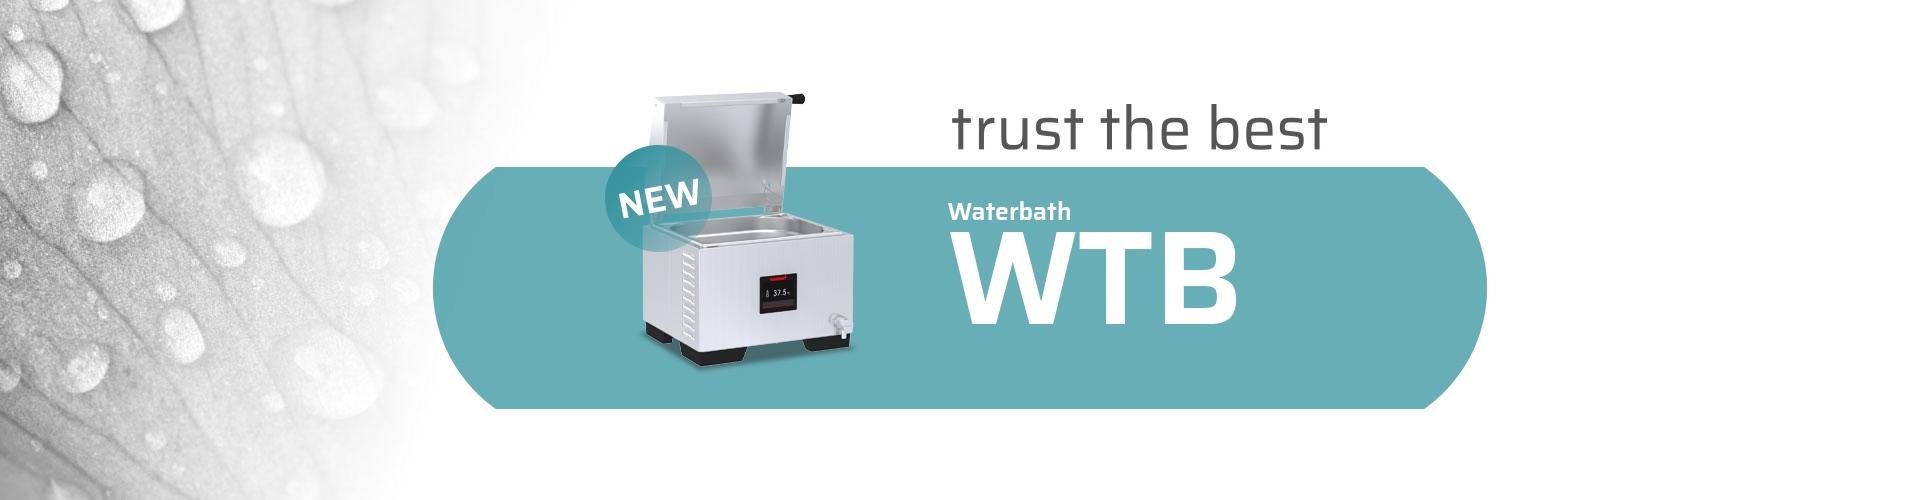 NIEUW - WTB waterbad img